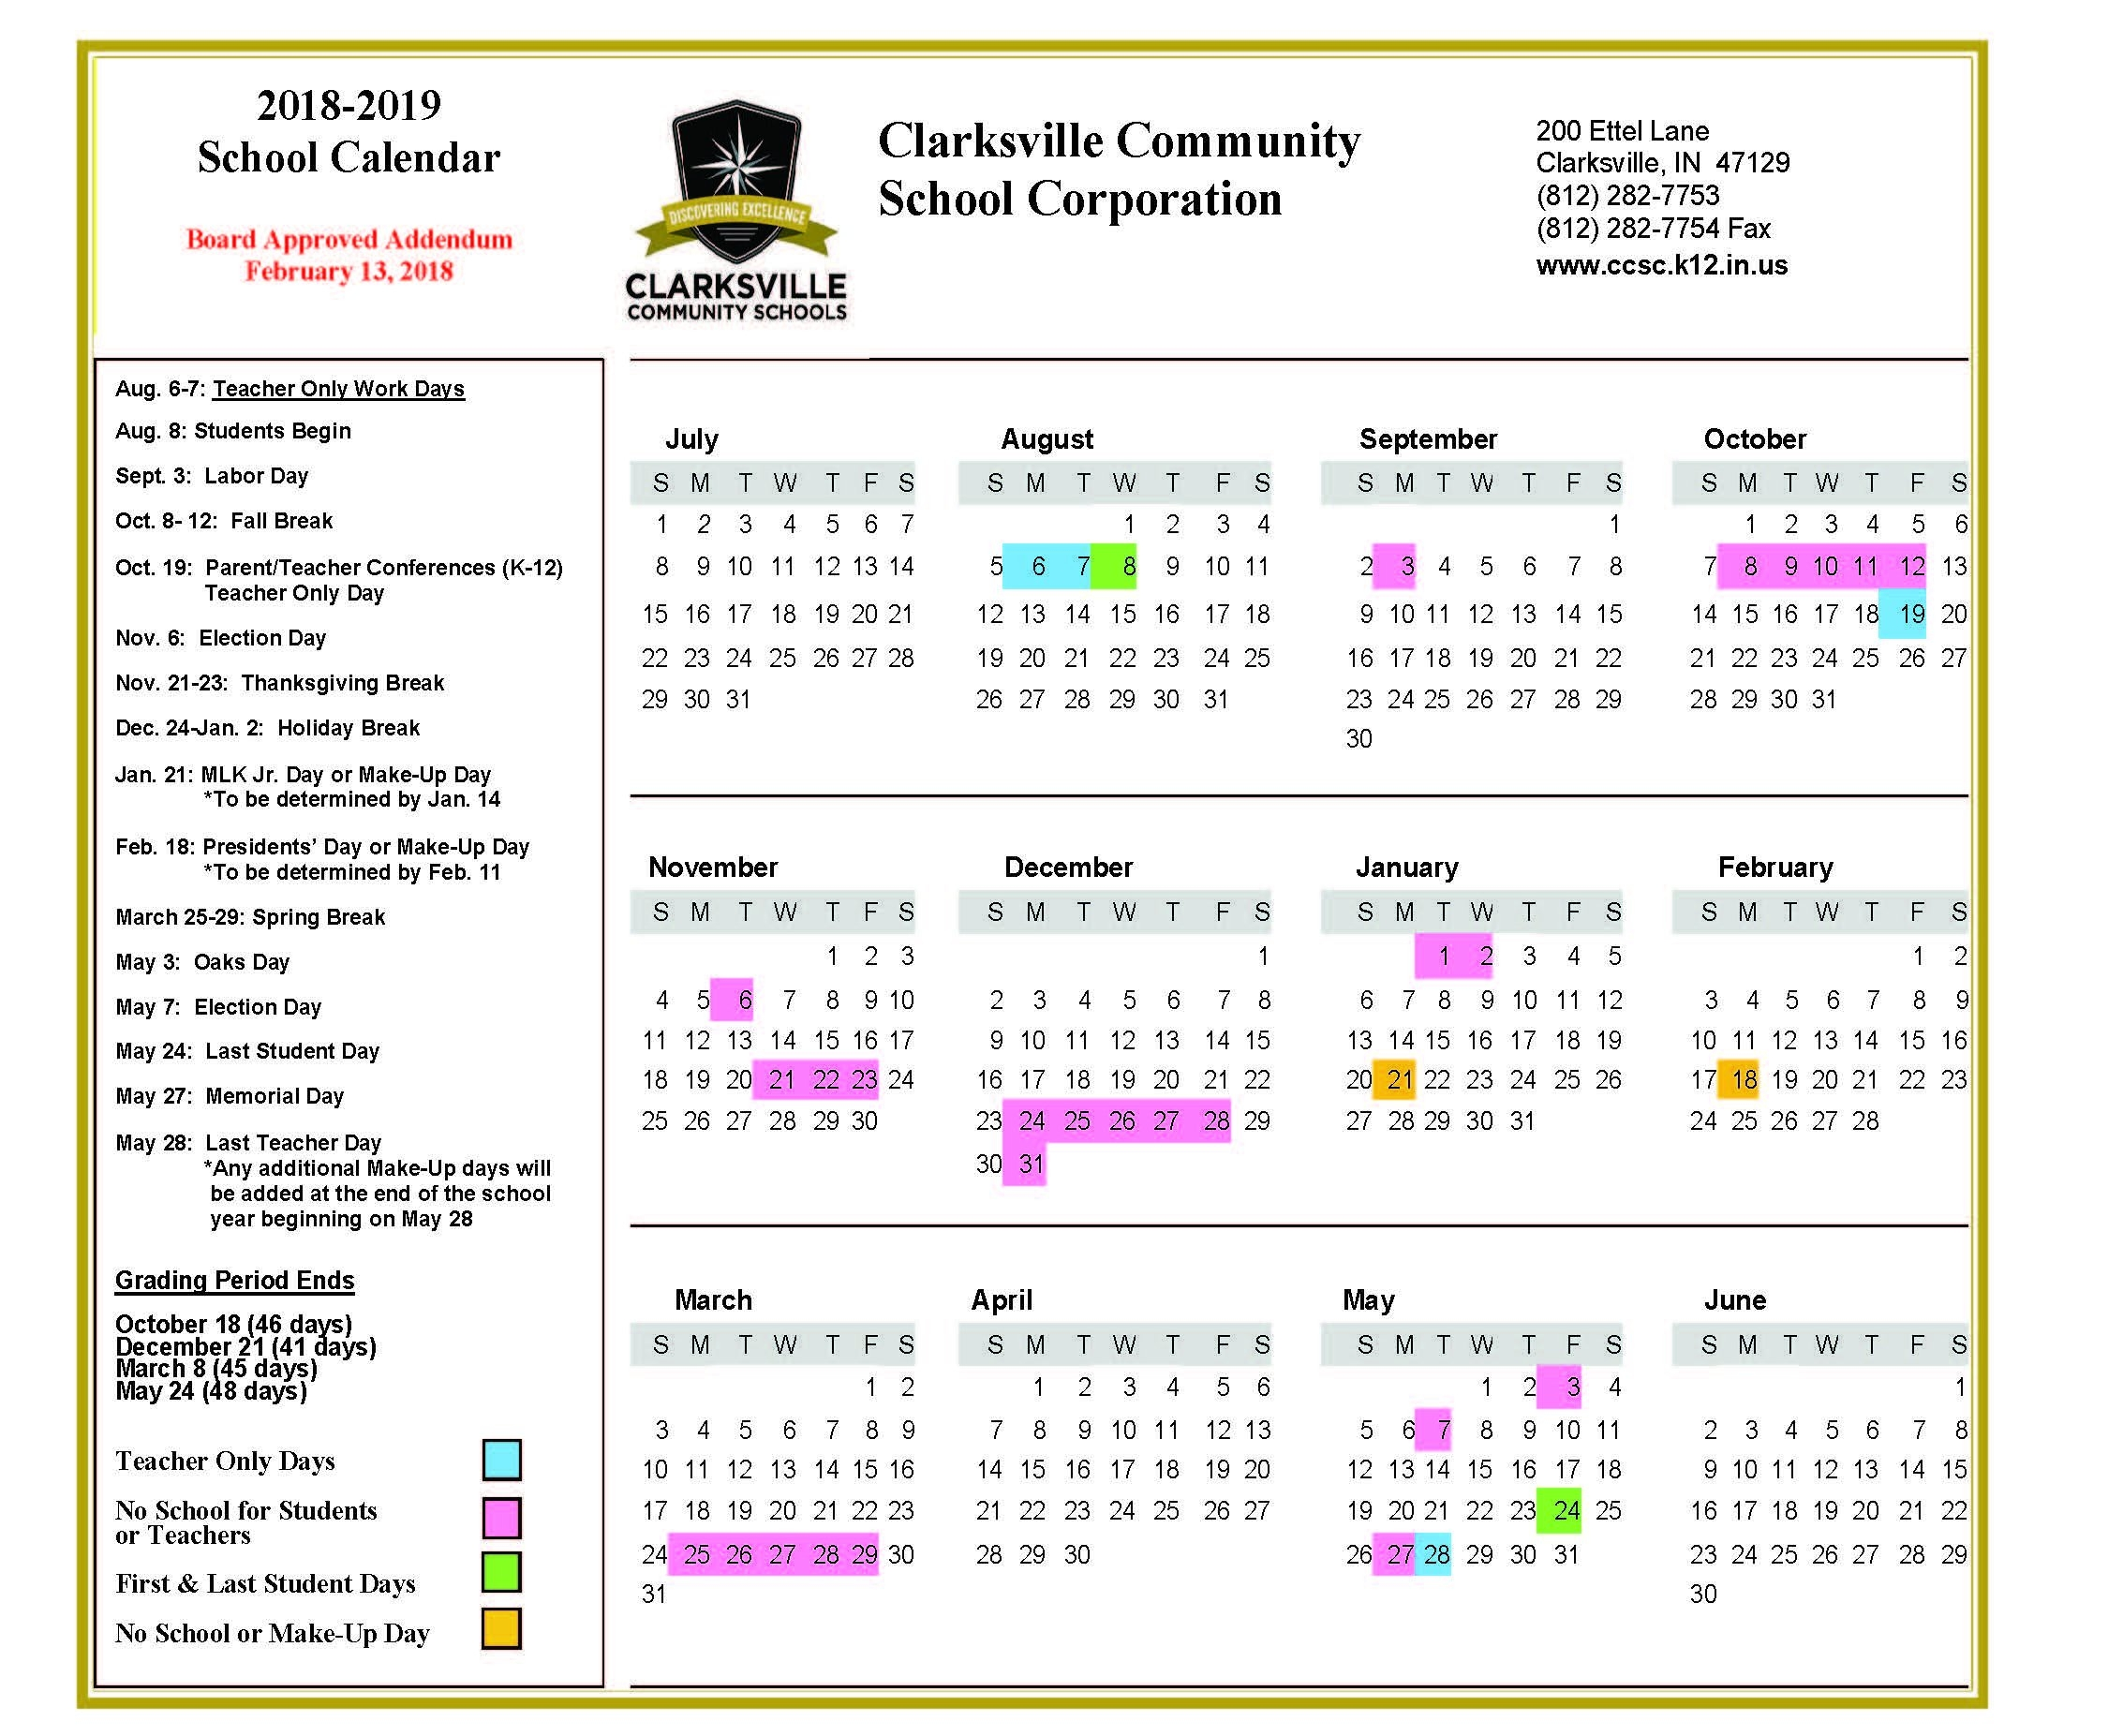 2018 2019 School Calendar Approvedboard   Clarksville Community Calendar 2019 School